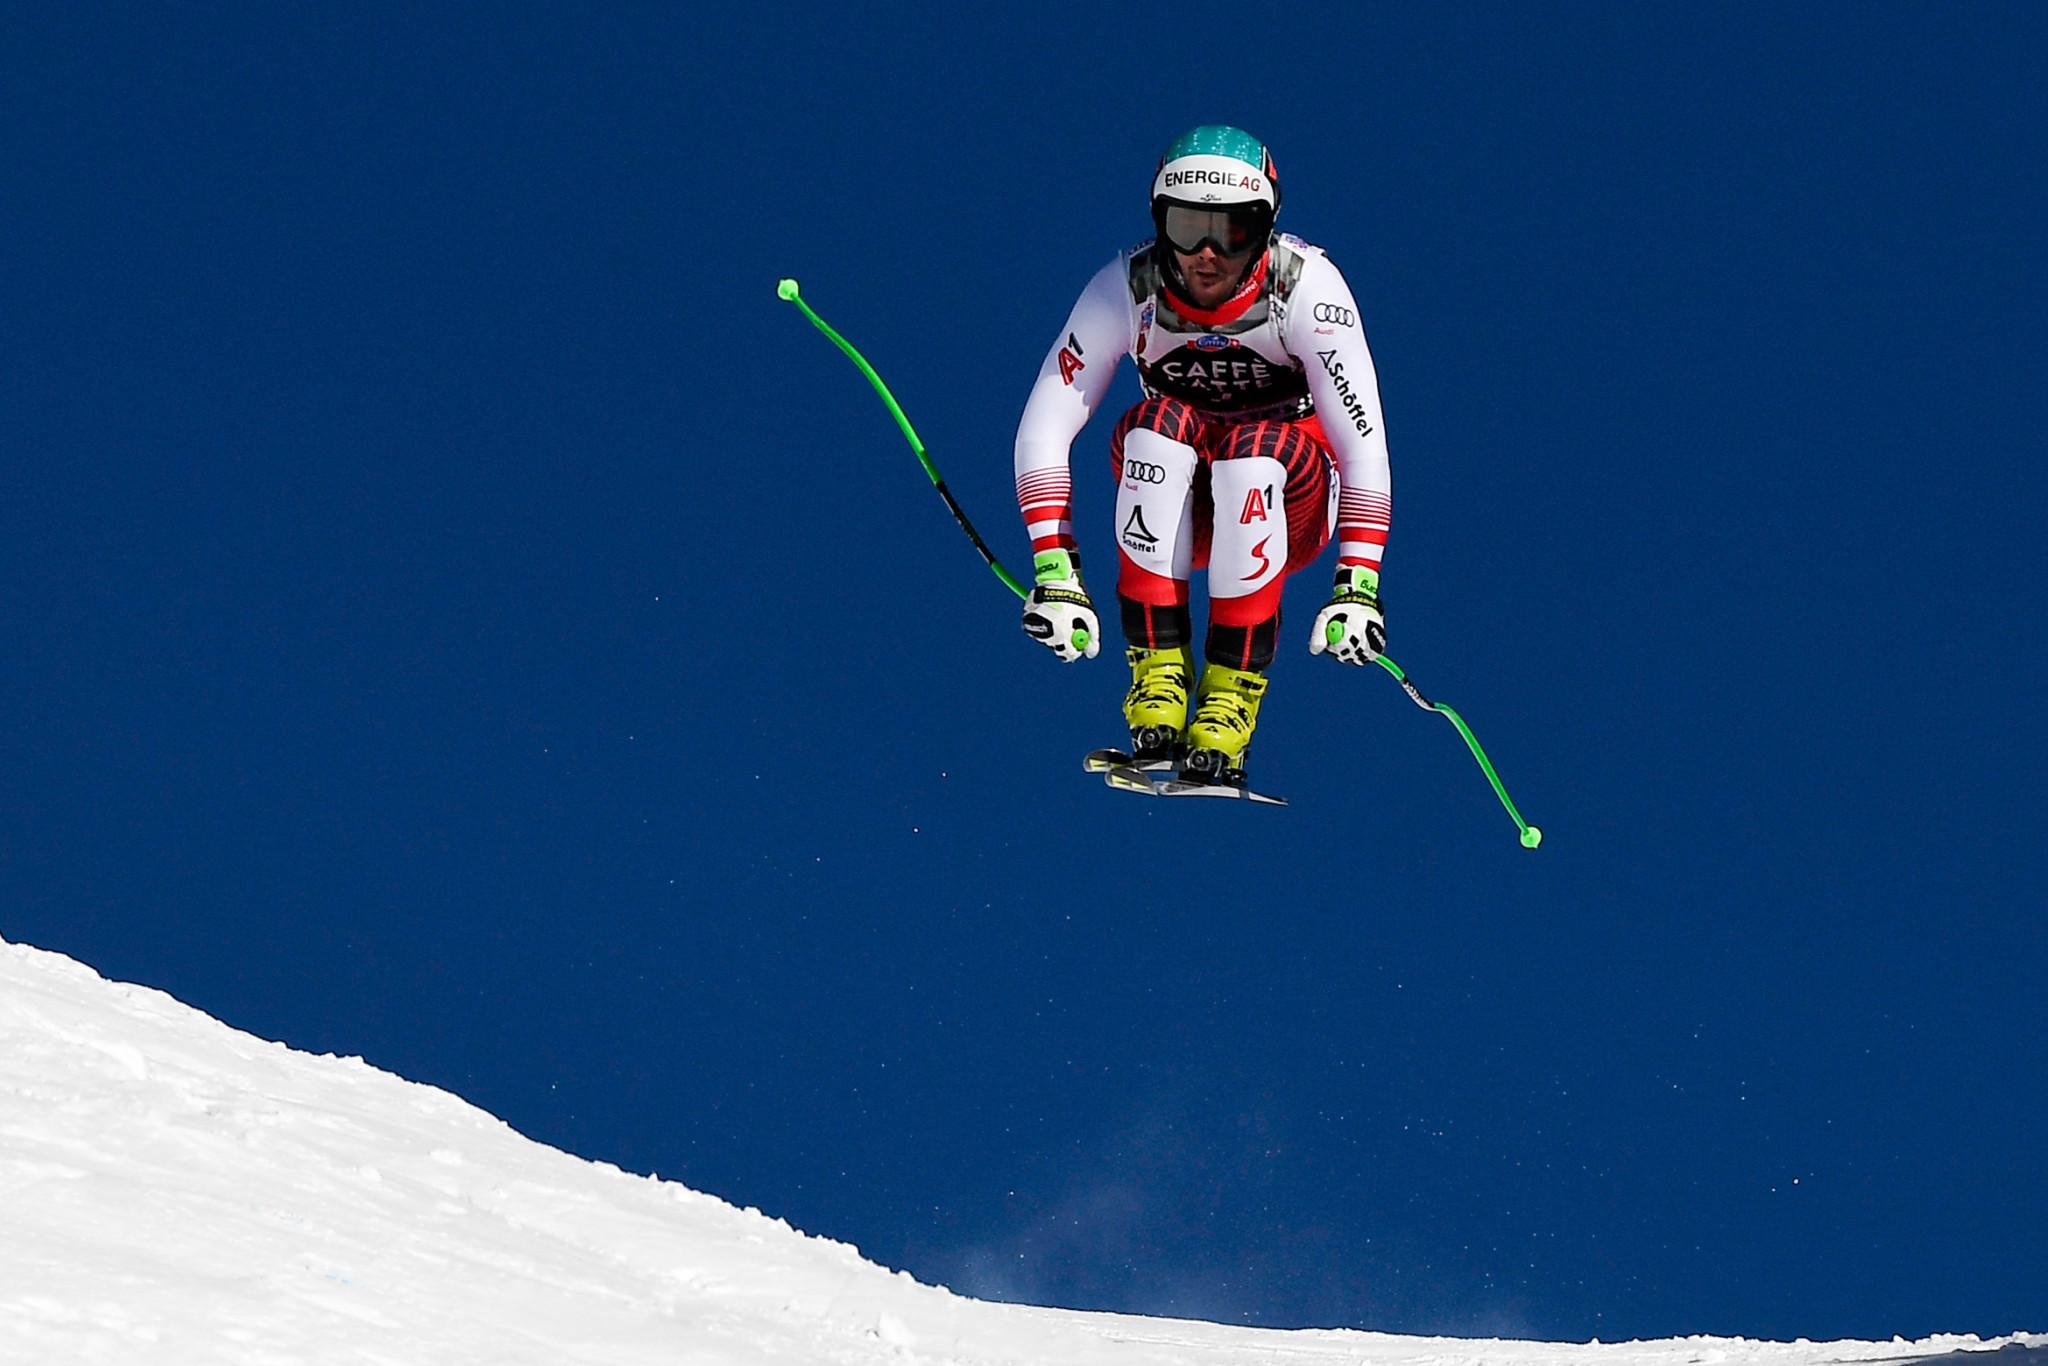 Austrian Vincent Kriechmayr won the men's downhill event in Wengen ©Getty Images